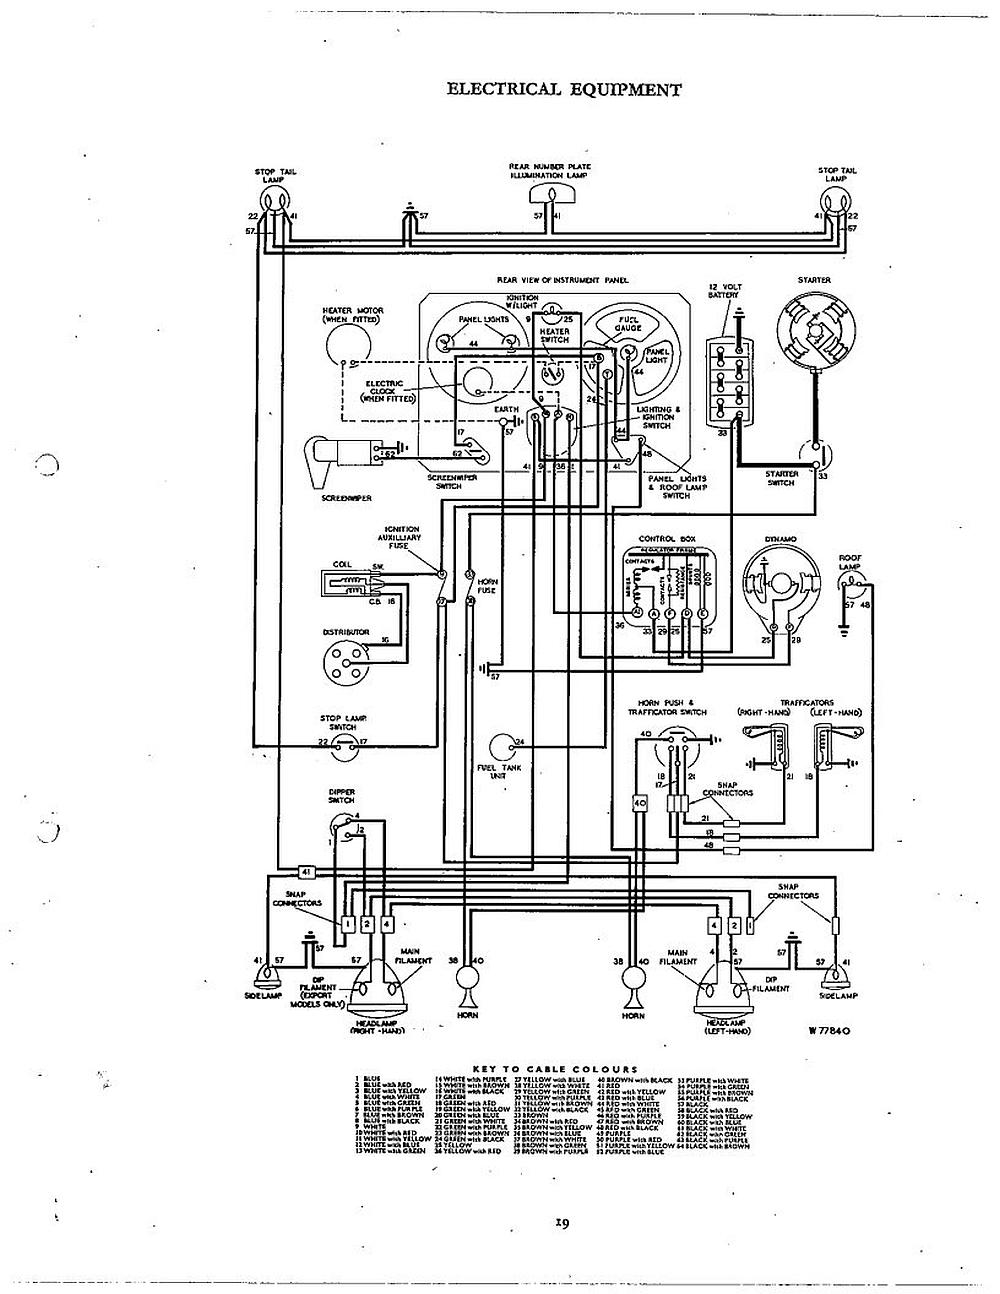 1975vwbeetlewiringdiagram Triumph Spitfire Wiring Diagram On